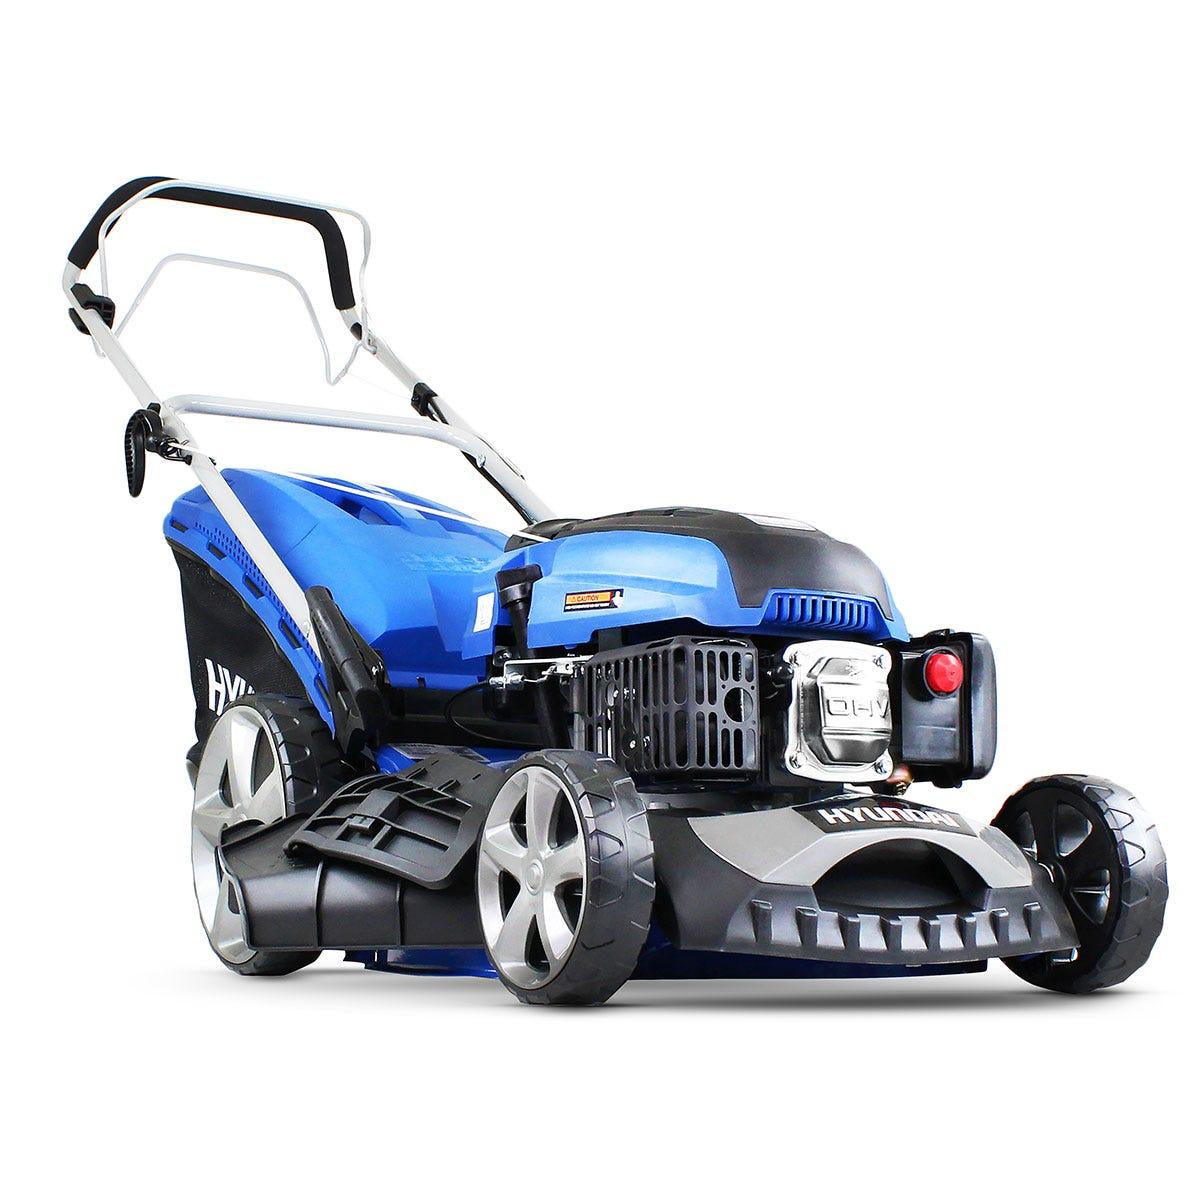 HYUNDAI HYM460SP Cordless Rotary Lawn Mower - Blue, Blue